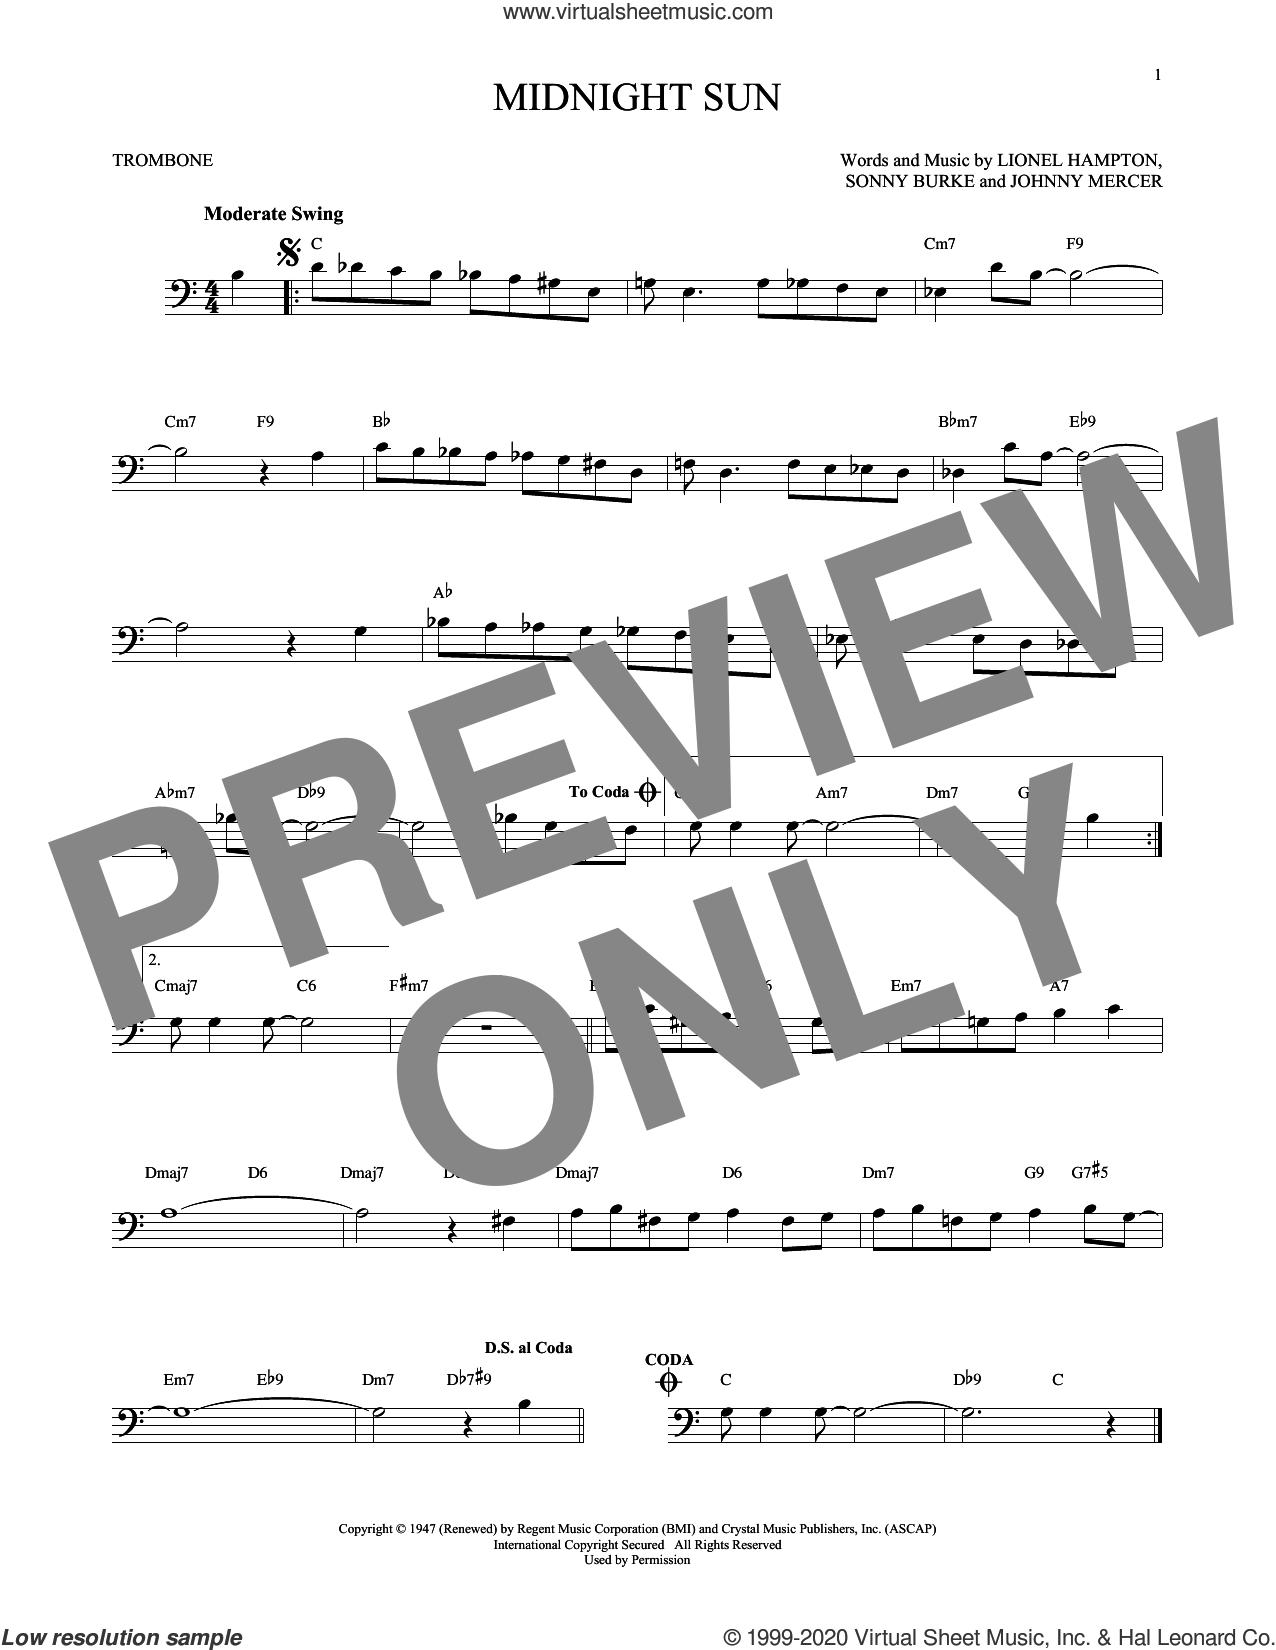 Midnight Sun sheet music for trombone solo by Johnny Mercer, Lionel Hampton and Sonny Burke, intermediate skill level